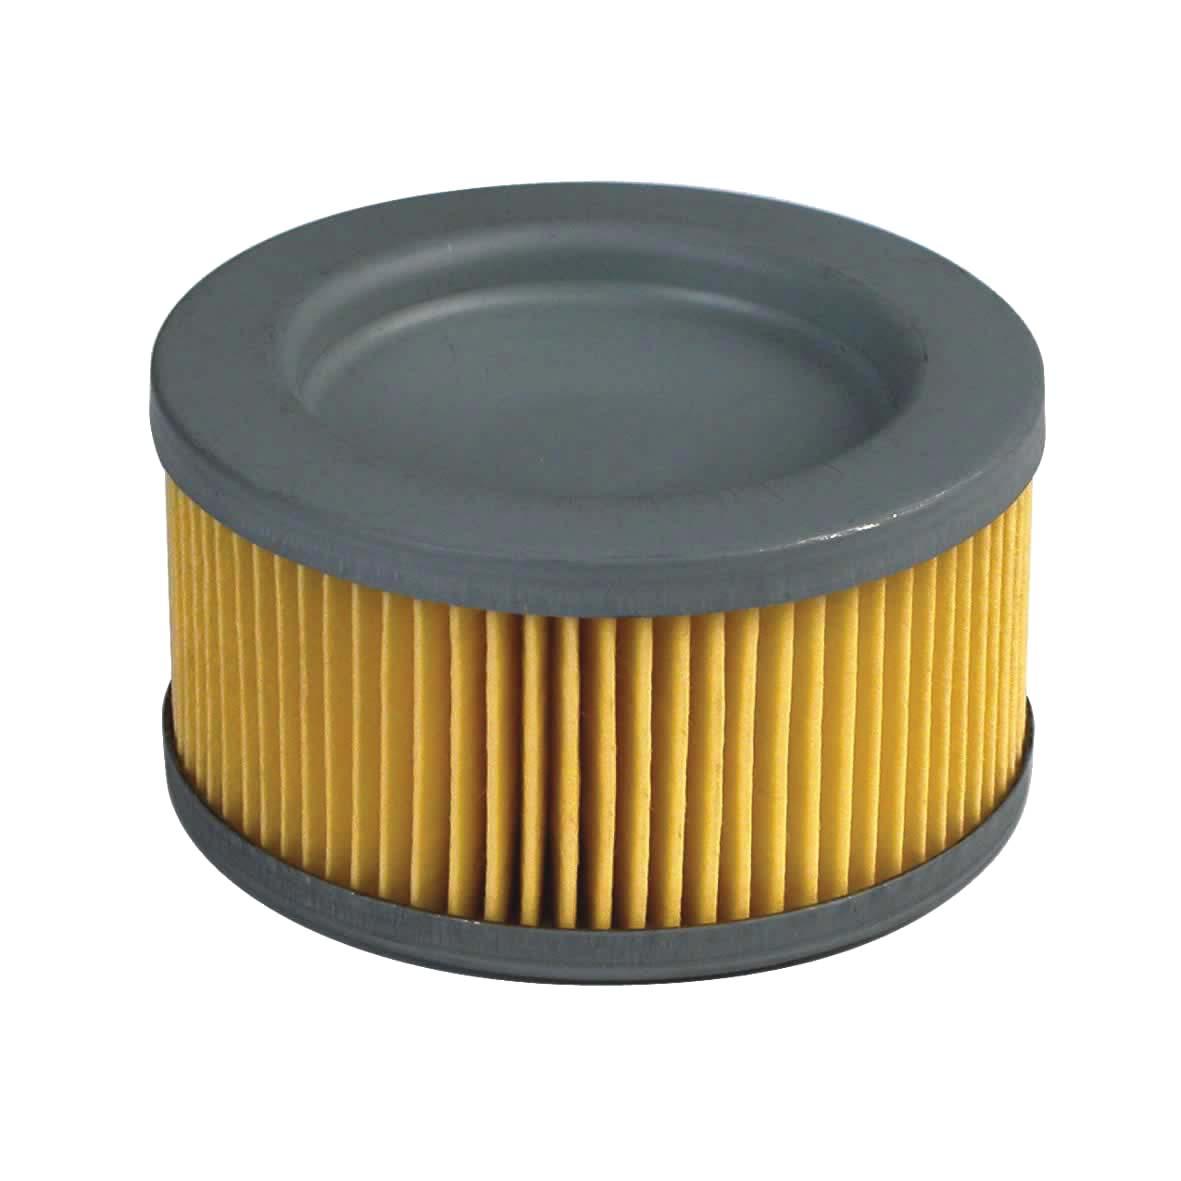 Blower Air Purifier : Air filter for stihl